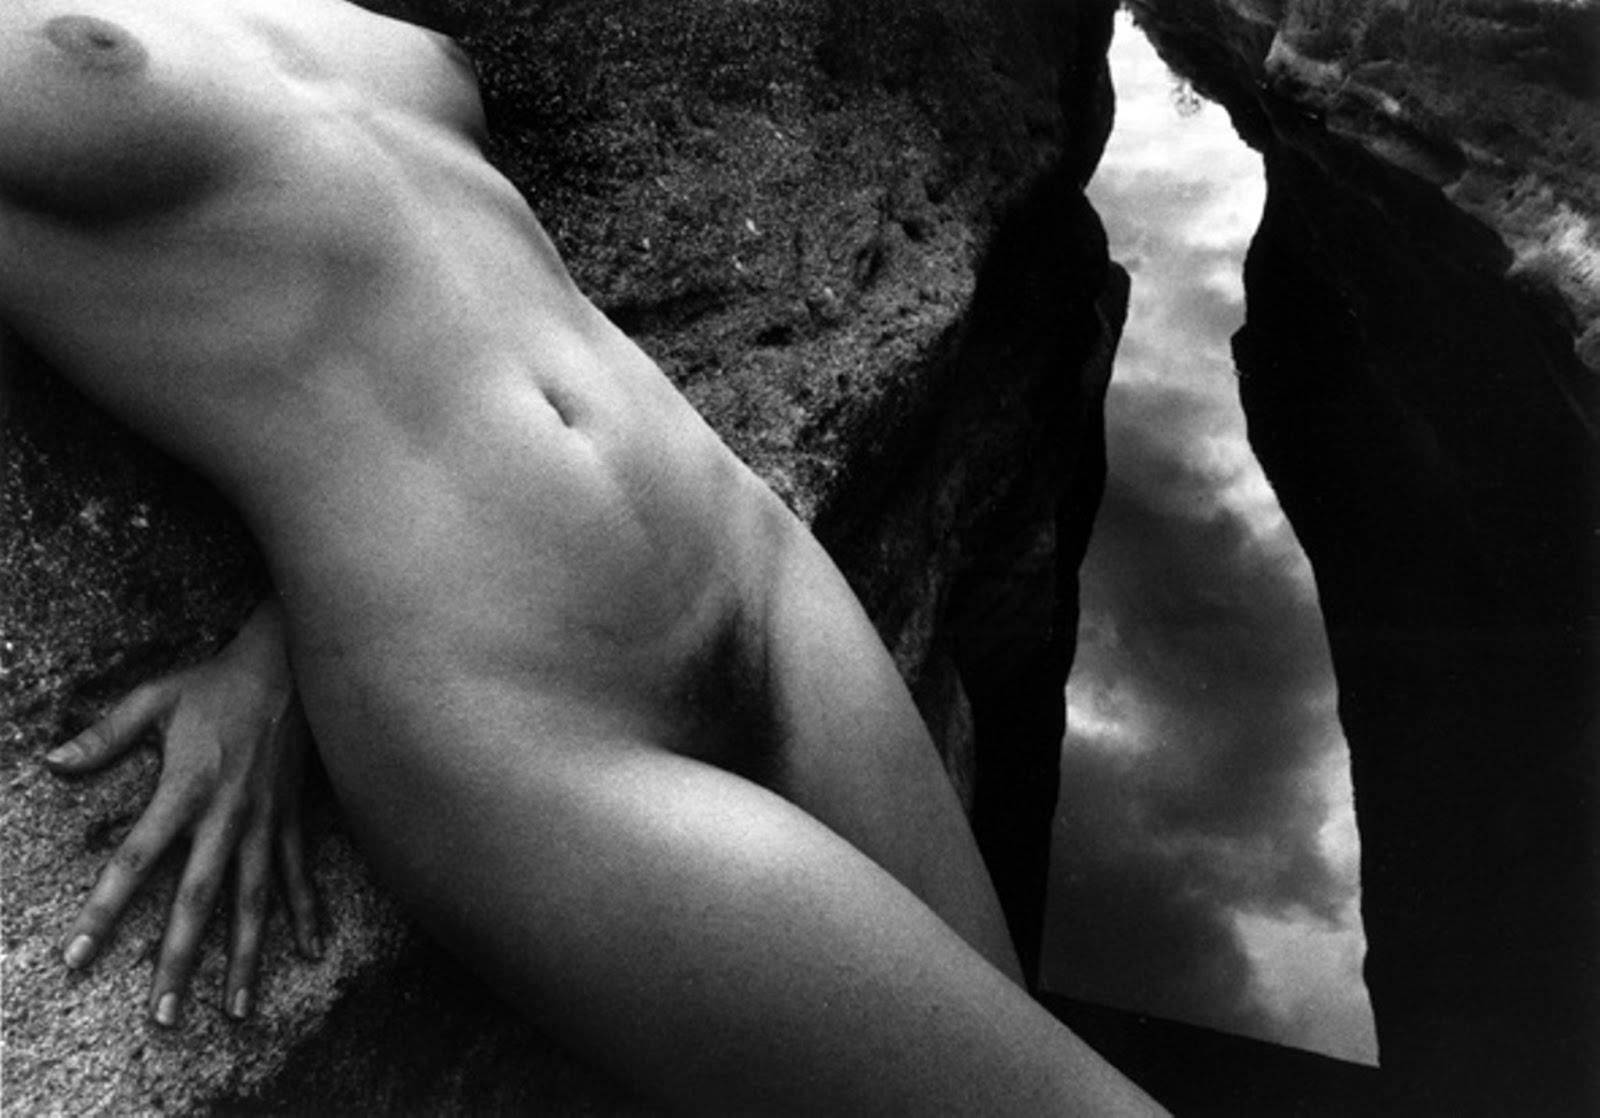 Nudes by french photographer christophe boussamba the nip slip